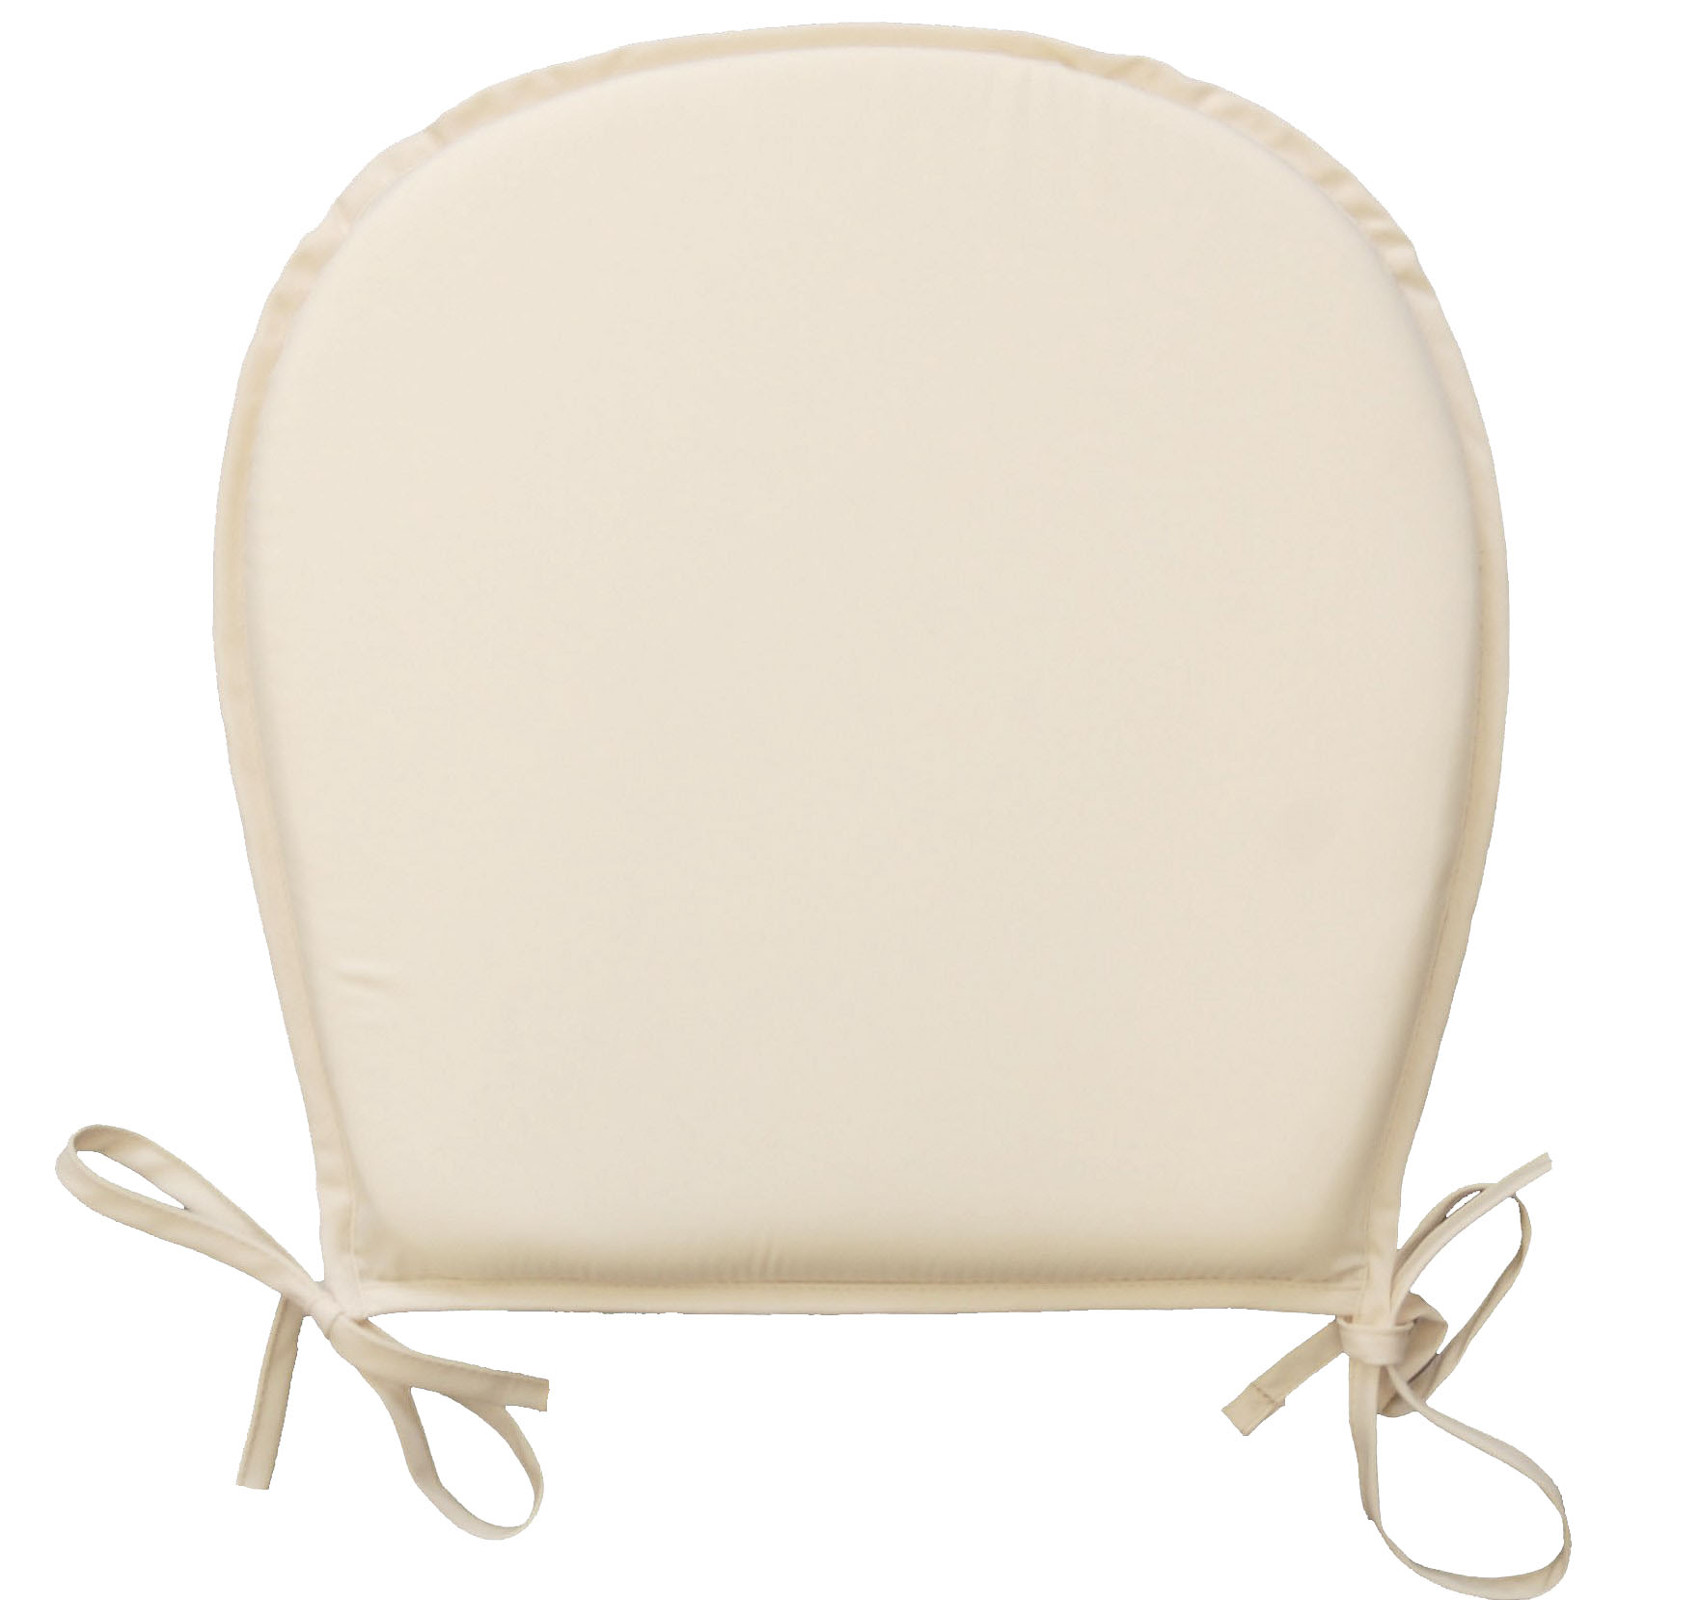 Round Kitchen Seat Pad Garden Furniture Dining Room Chair  : kitchen chair round seat pad stone from www.ebay.co.uk size 1700 x 1600 jpeg 162kB